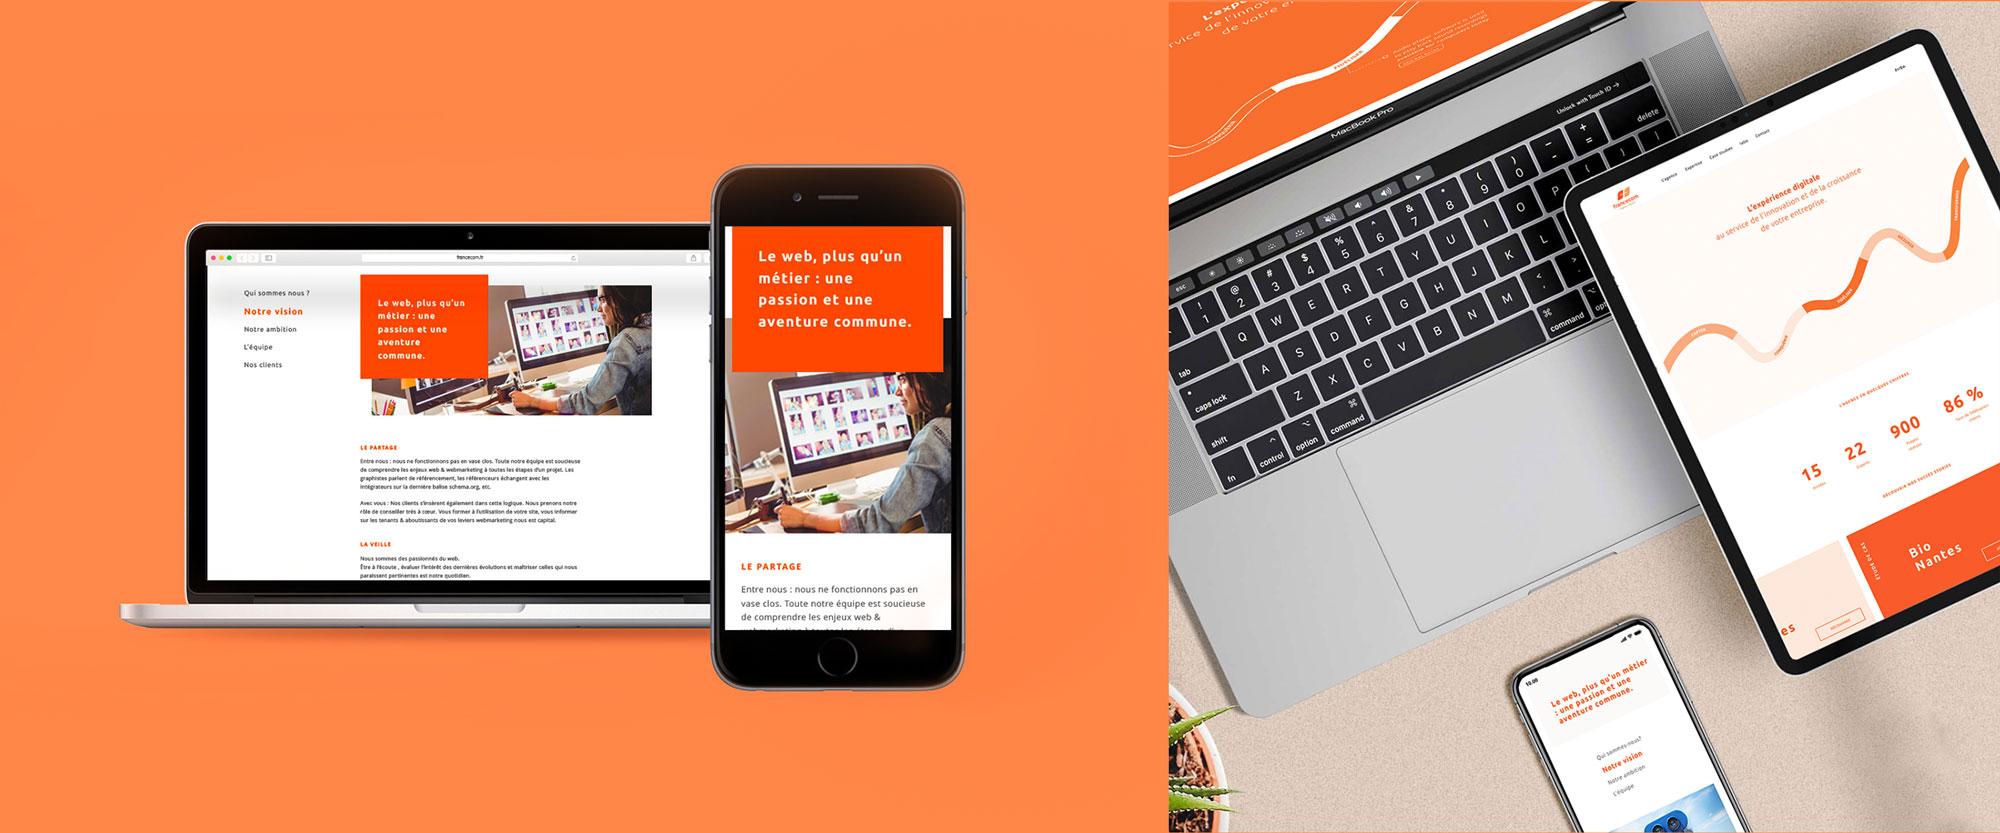 francecom responsive site web